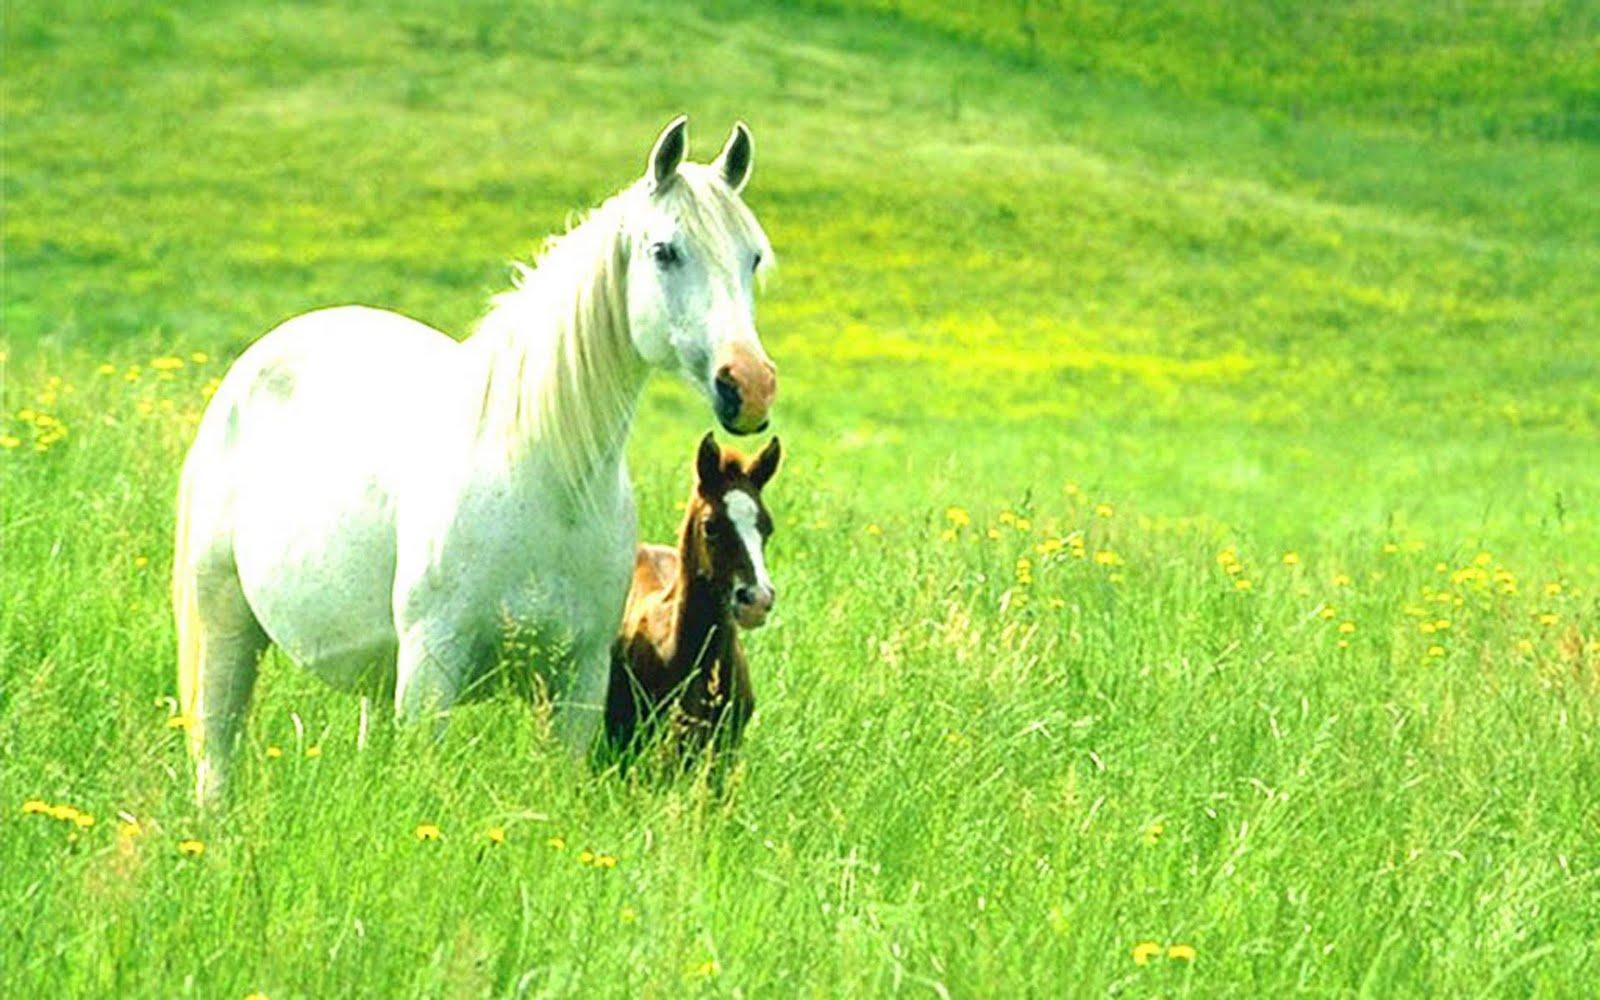 http://1.bp.blogspot.com/-YAhrerzHBGE/TfLcAMEQSsI/AAAAAAAAncQ/jubOvMy0_aI/s1600/Horses%2BWallpaper%2B%25282%25291.JPG